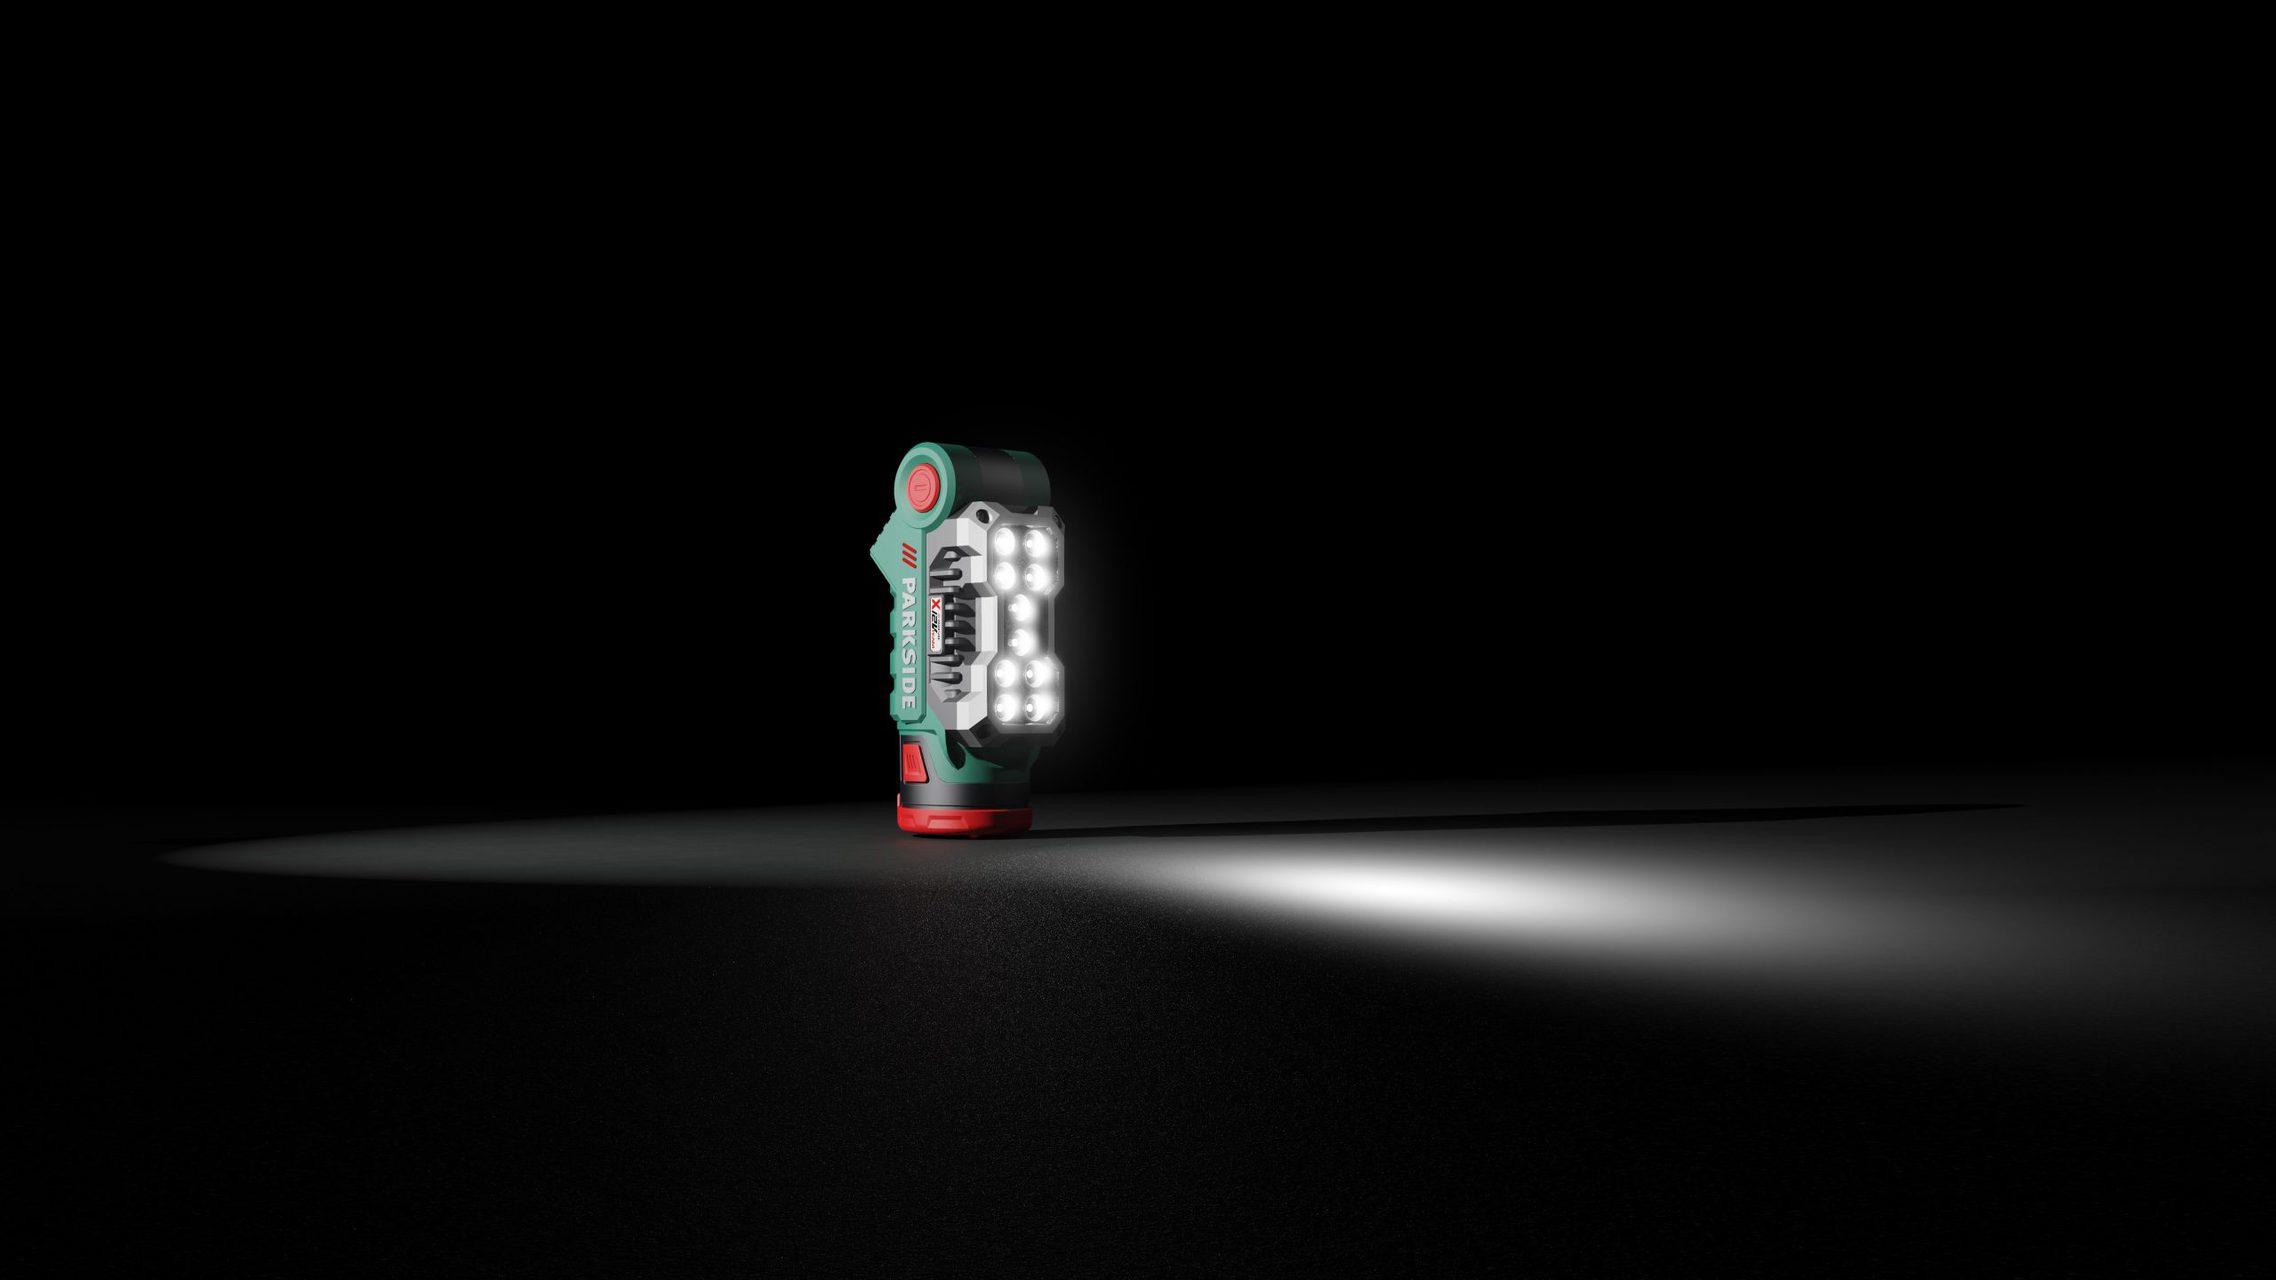 projekter_industrial_design_12v_arbeitslicht_led_panel_light